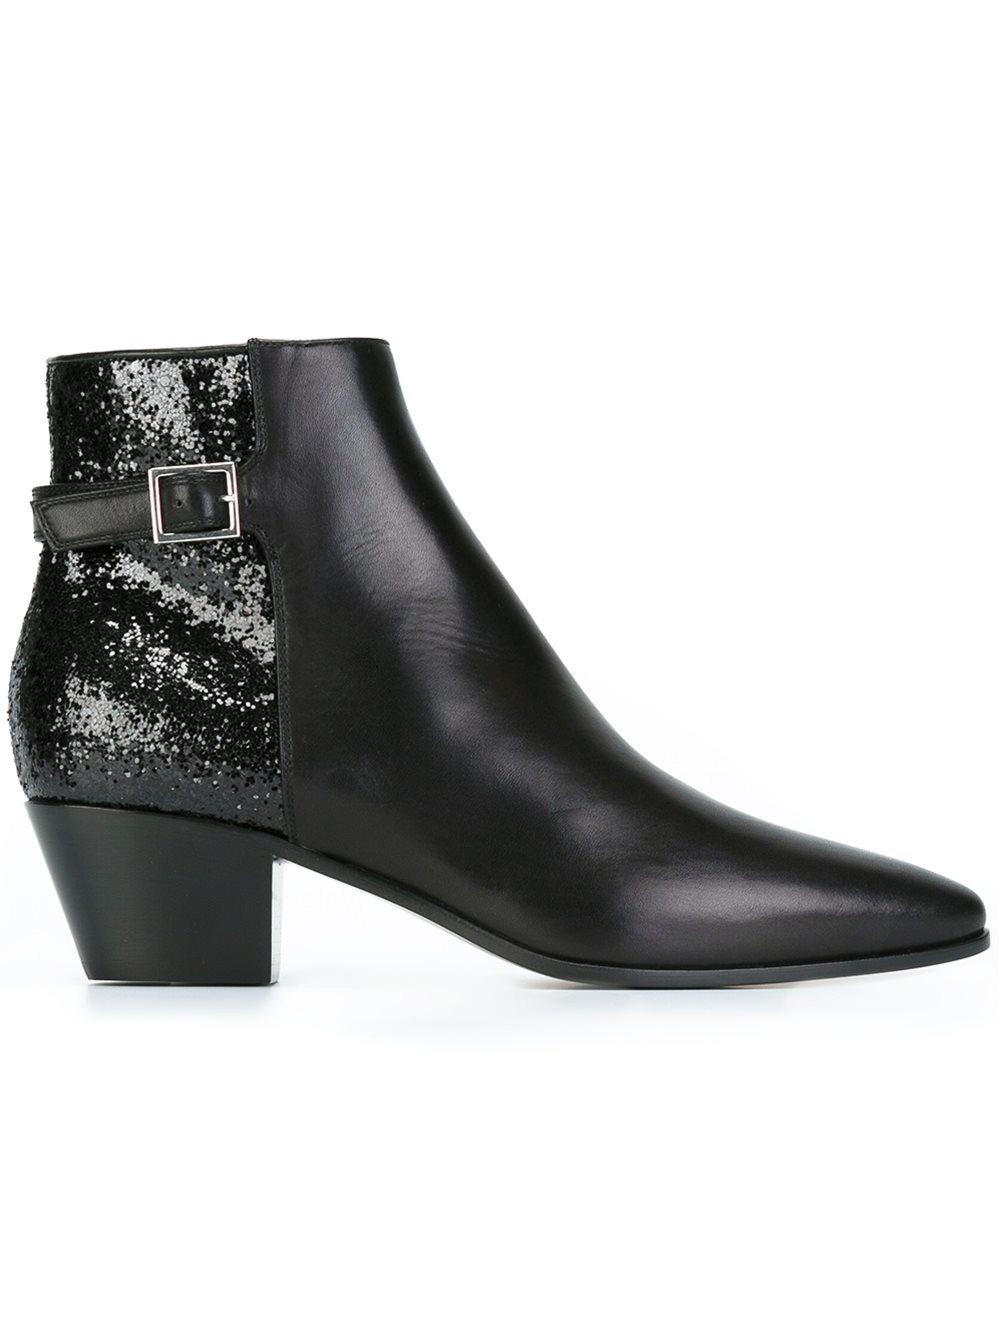 Saint Laurent Rock Glitter Leather Ankle Boots in Black - Lyst